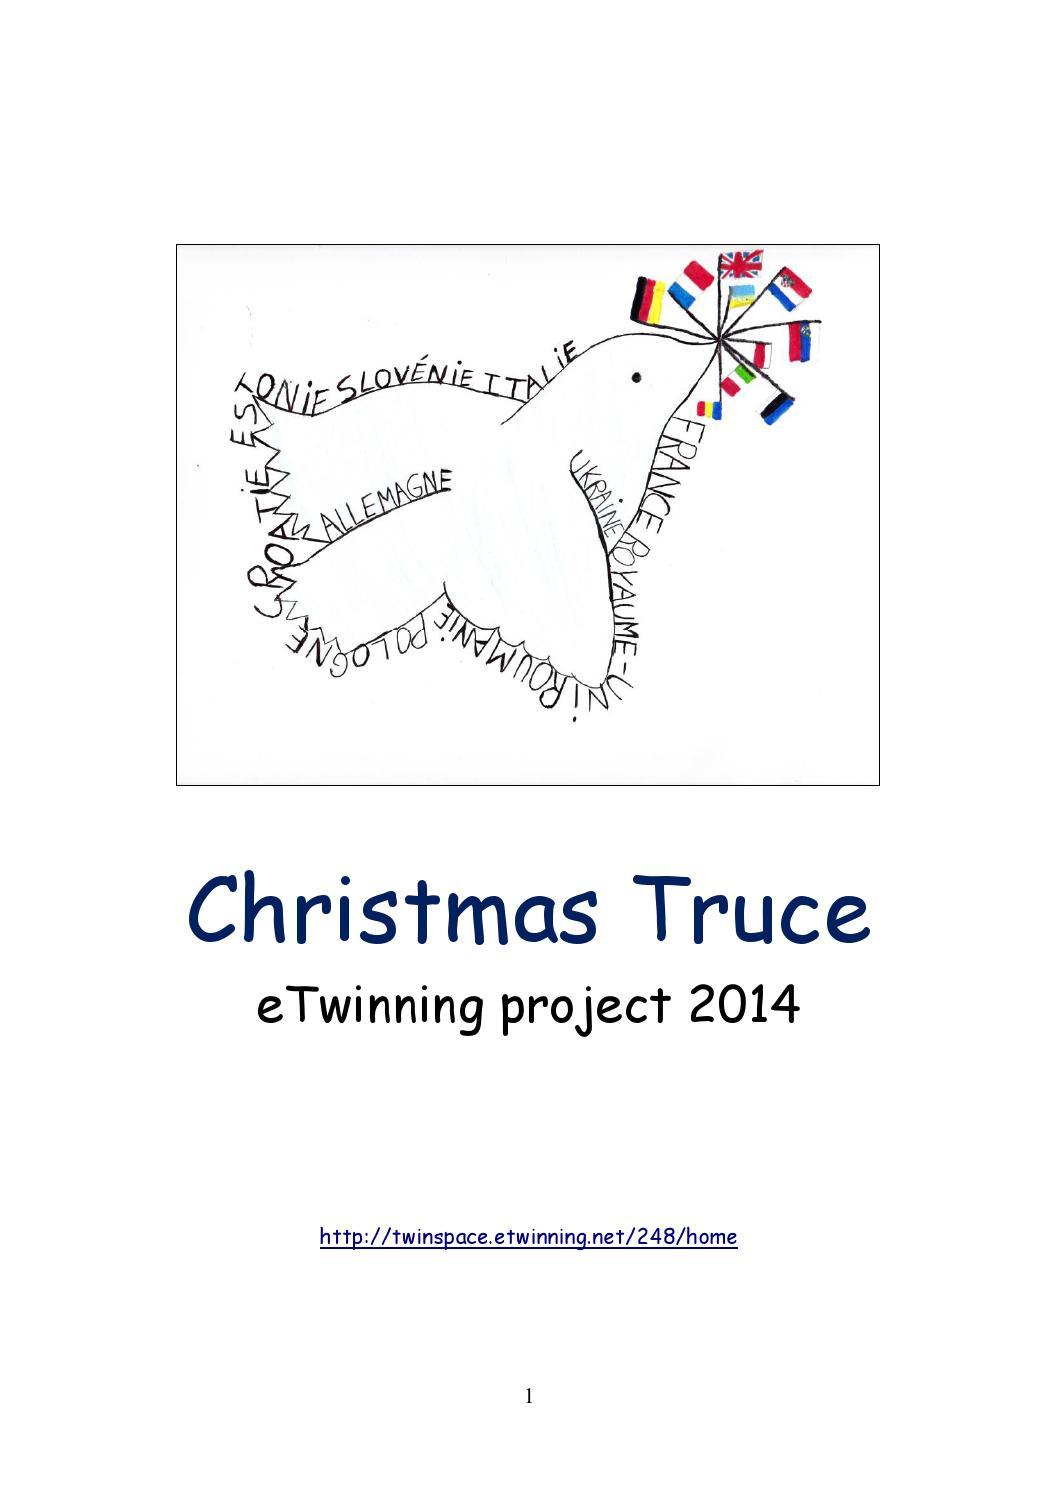 Ebook Christmas Truce eTwinning Project by DJLinford - issuu